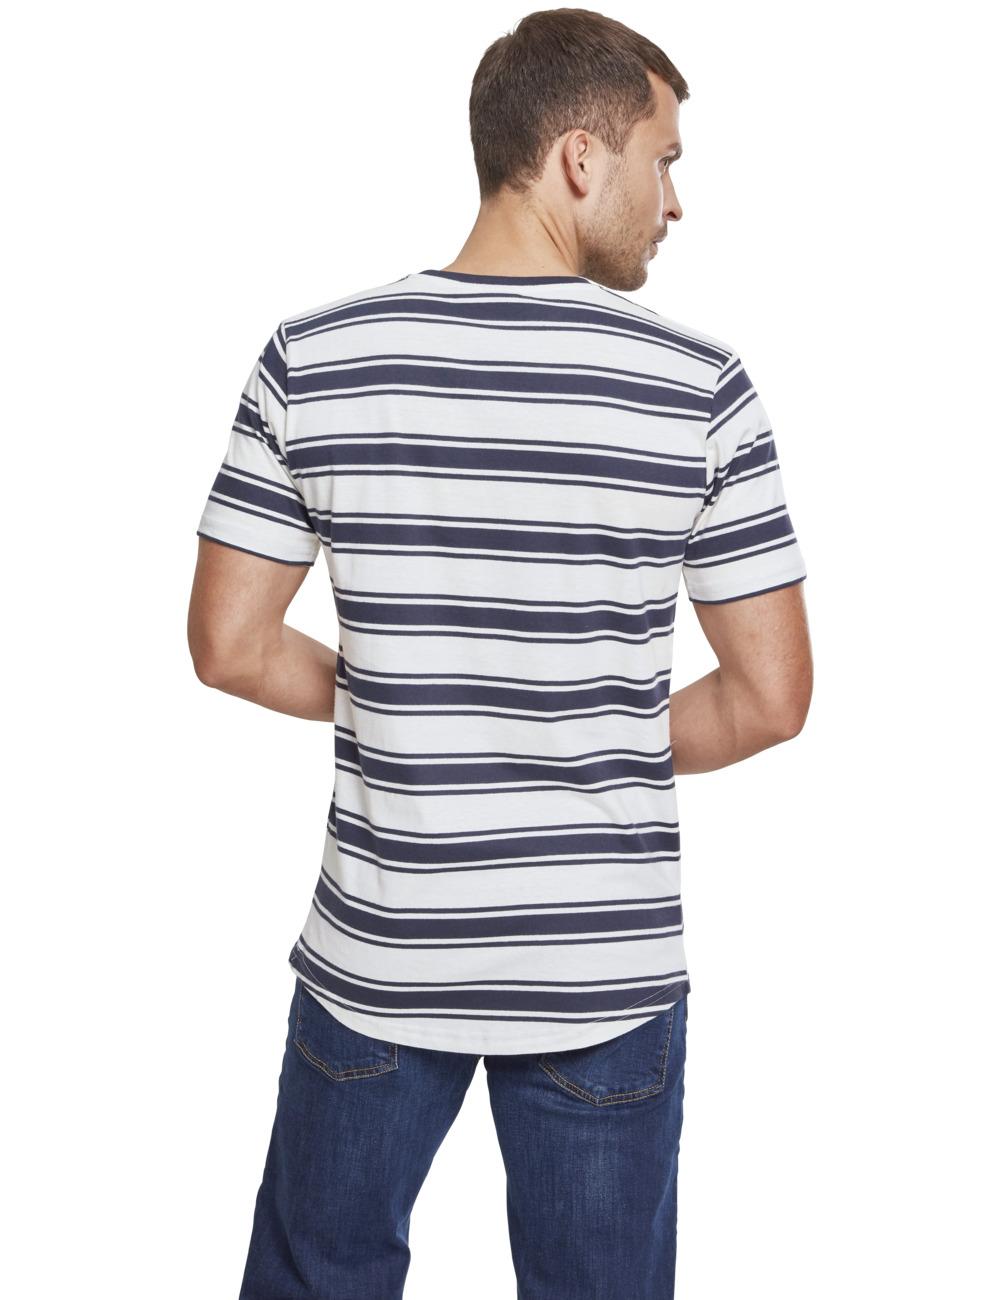 urban-classics-herren-t-shirt-double-stripe-long-shaped-tee-regular-fit